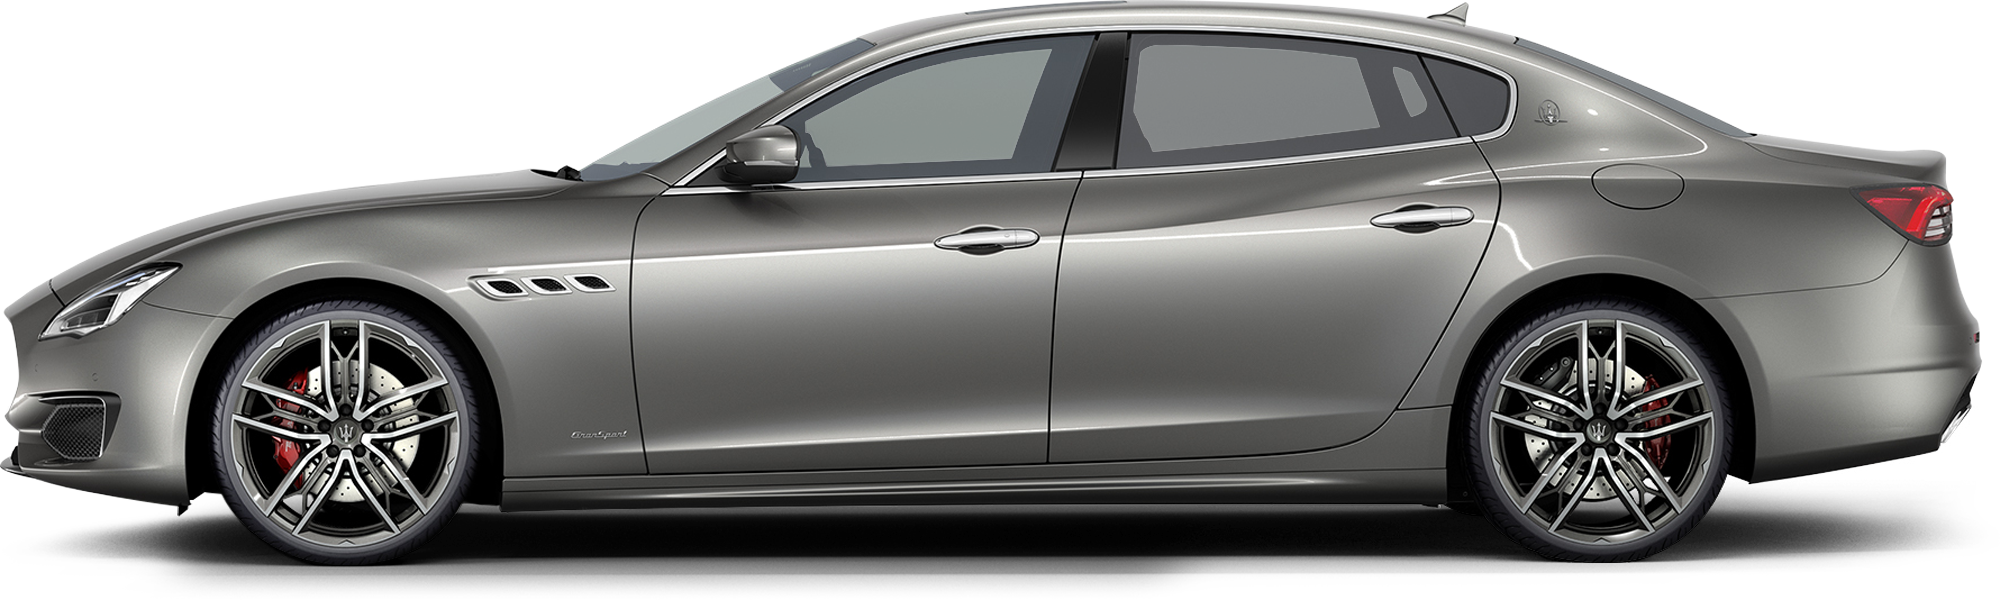 2021 Maserati Quattroporte Sedan S